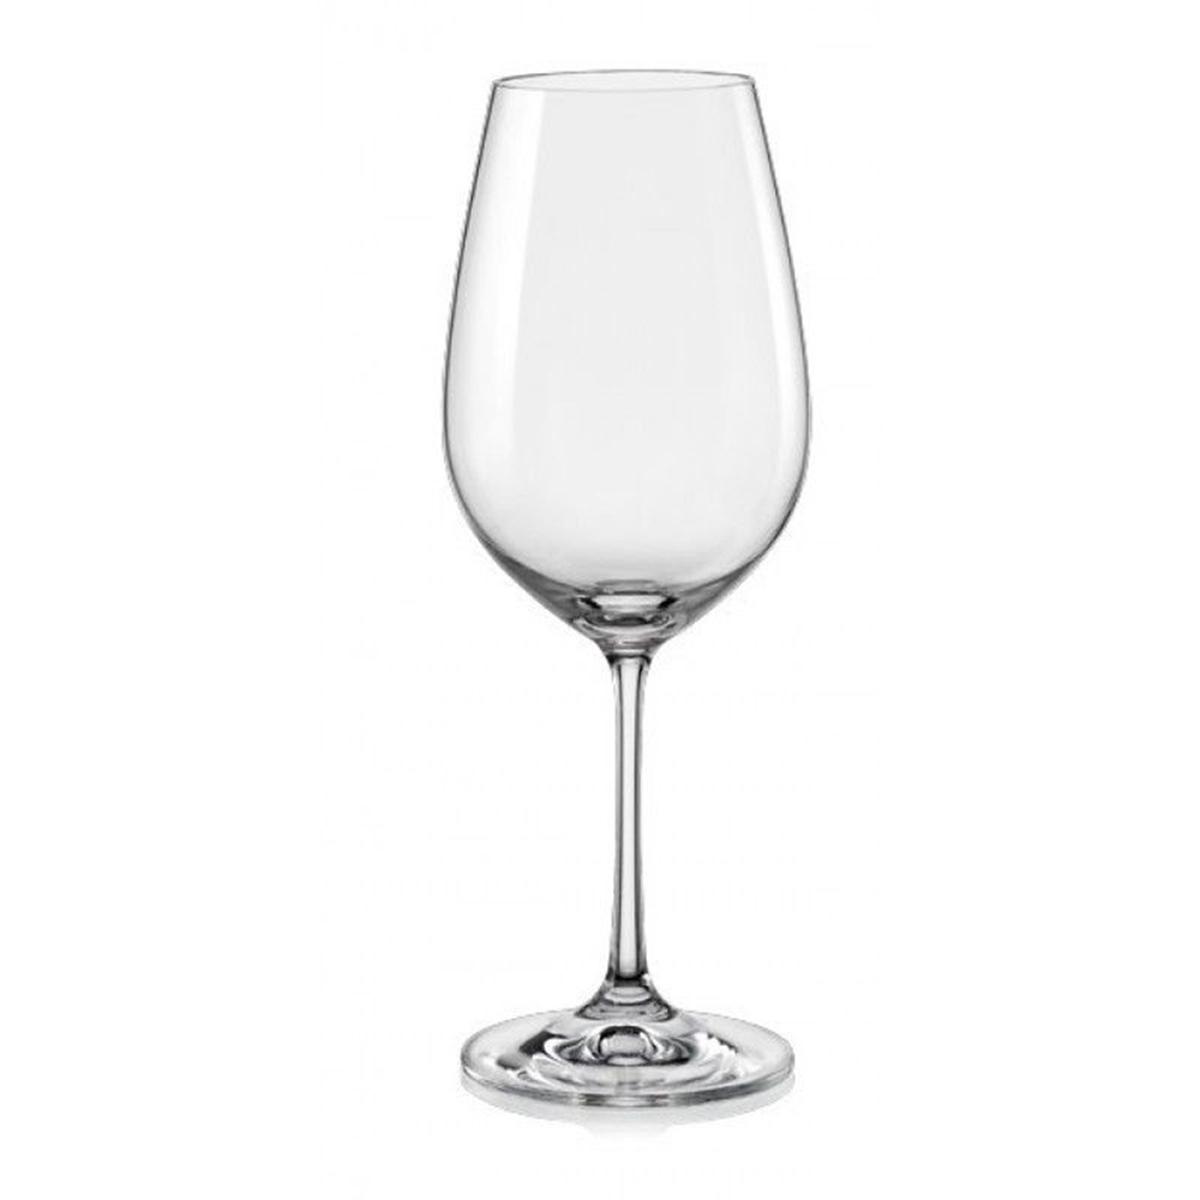 Набор бокалов для вина Bohemia Crystal Виола, 350 мл, 6 шт rostok visa набор для выращивания виола